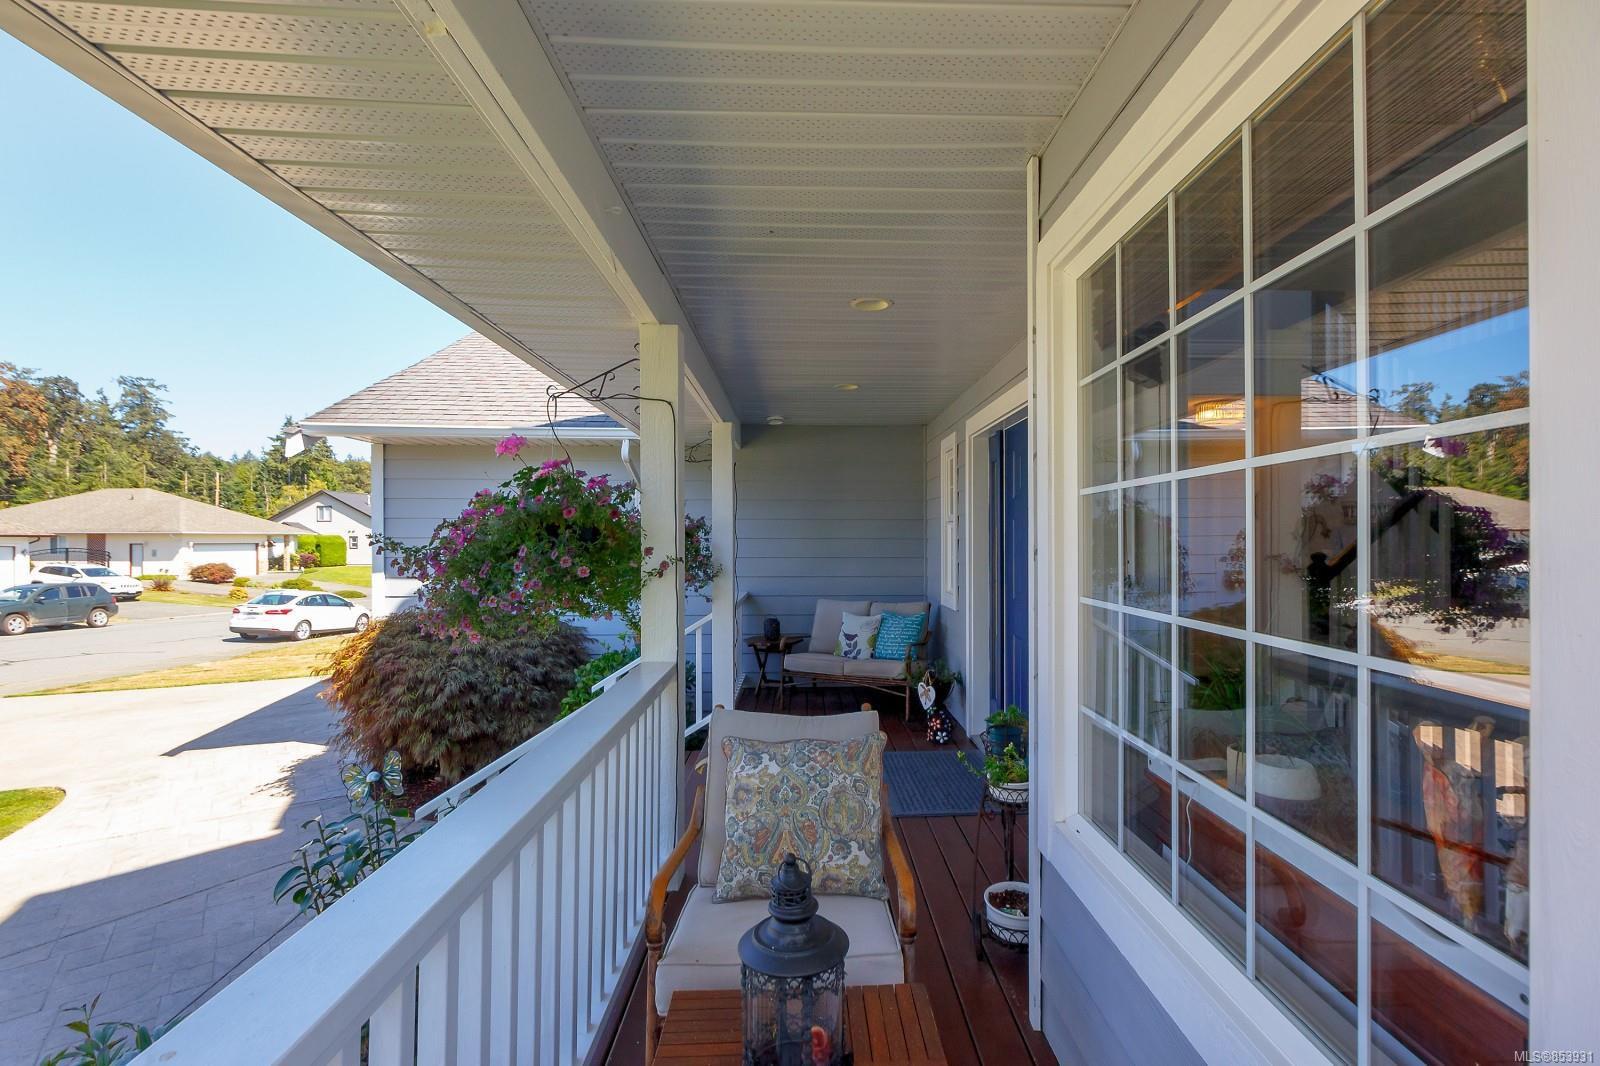 Photo 25: Photos: 2456 Timbercrest Dr in : Du East Duncan House for sale (Duncan)  : MLS®# 853931